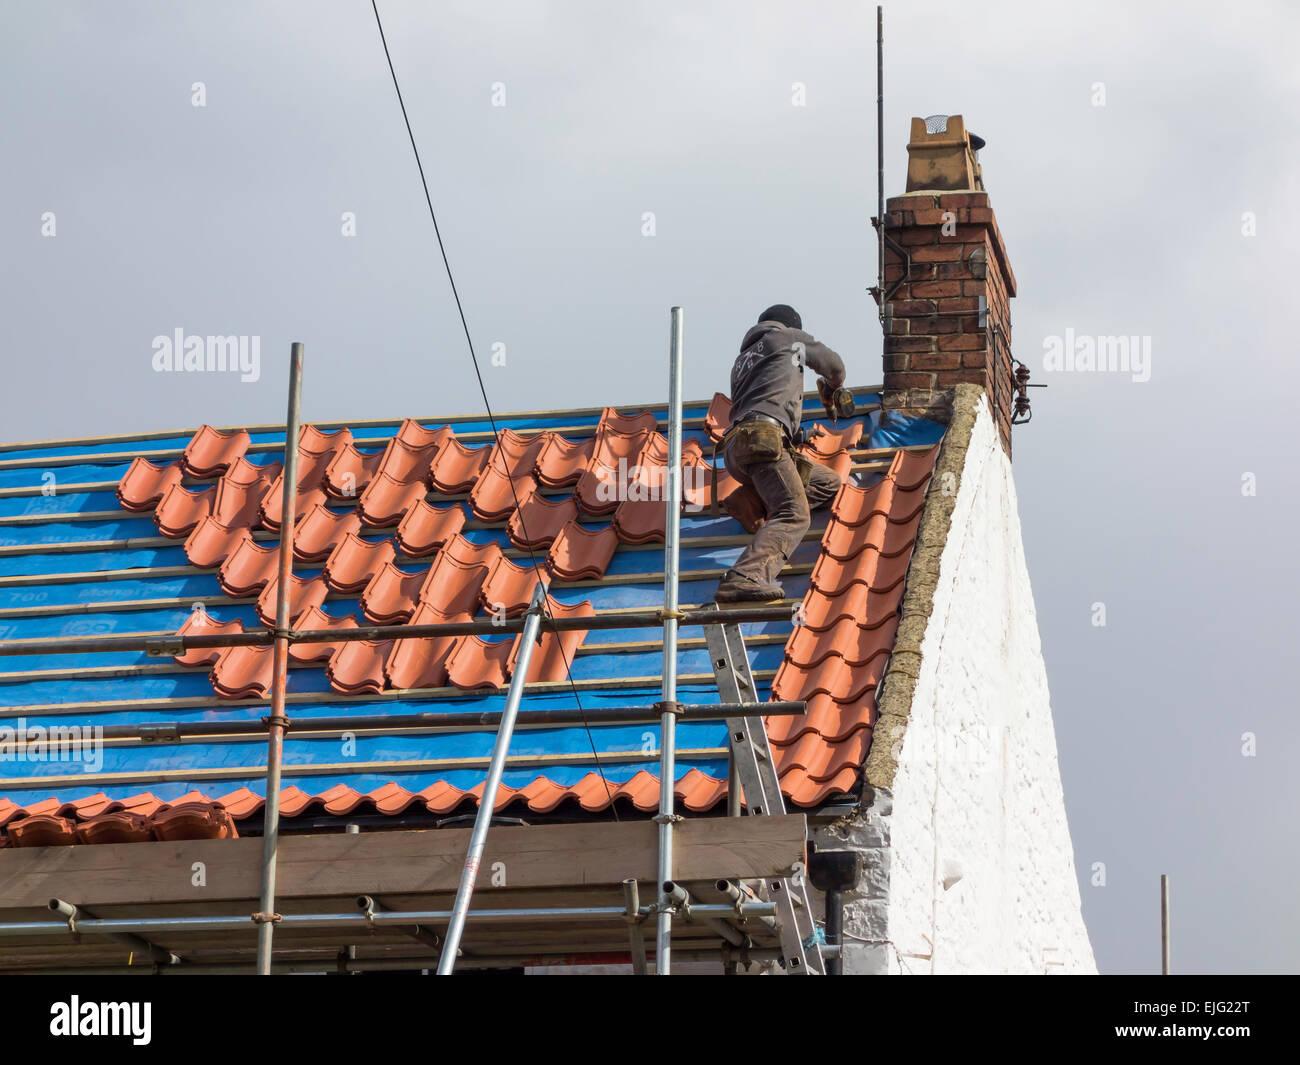 A Tiler Man Replacing Roof Tiles On A House